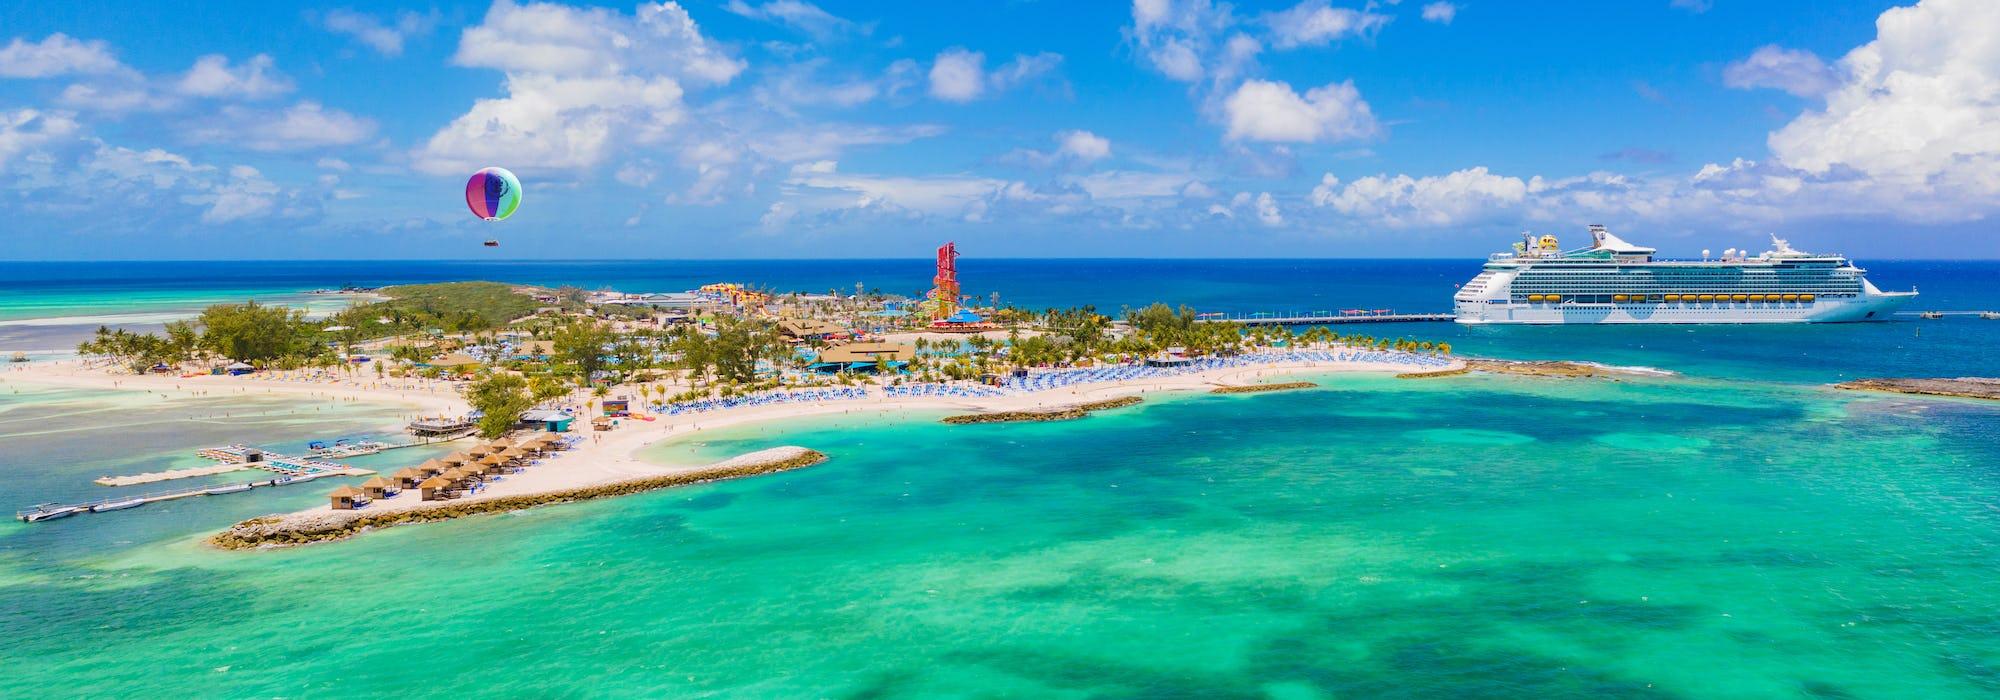 Mariner of the Seas i bakgrunden lämnar Royal Caribbeans egna ö - Perfect day at CocoCay.